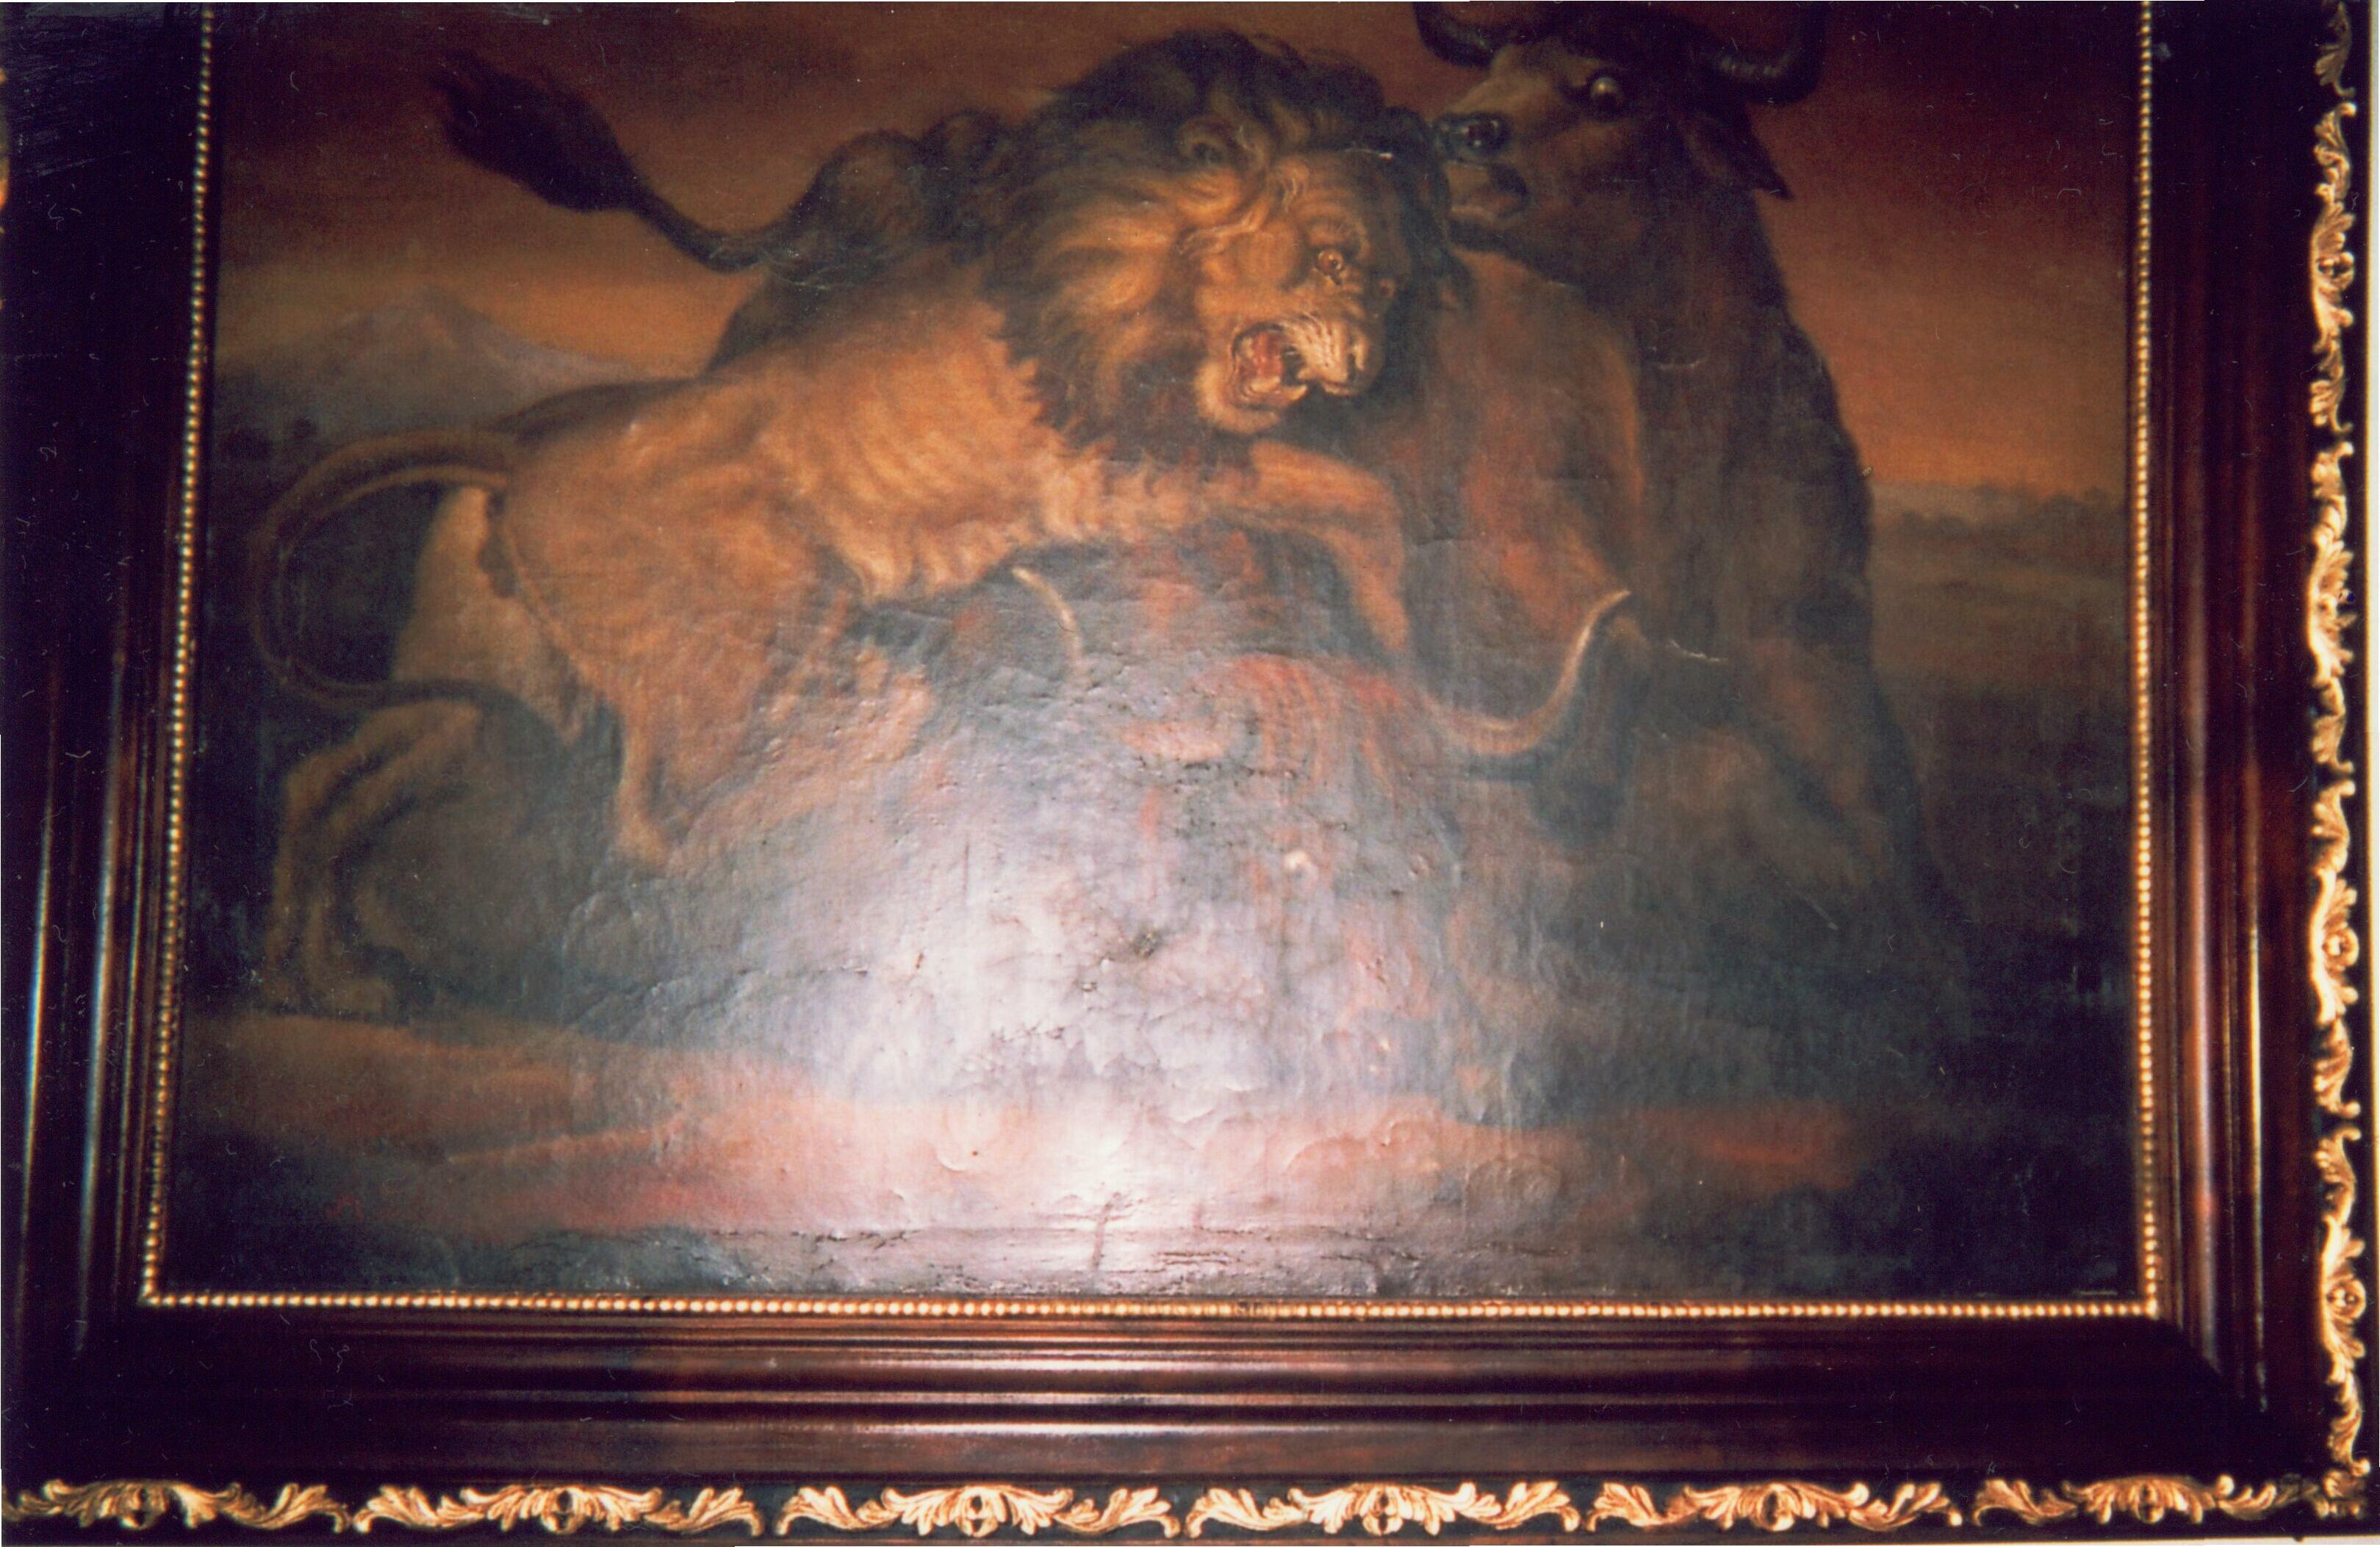 3239 x 2106 · jpeg, Lukisan Raden Saleh (Tahun 1861)